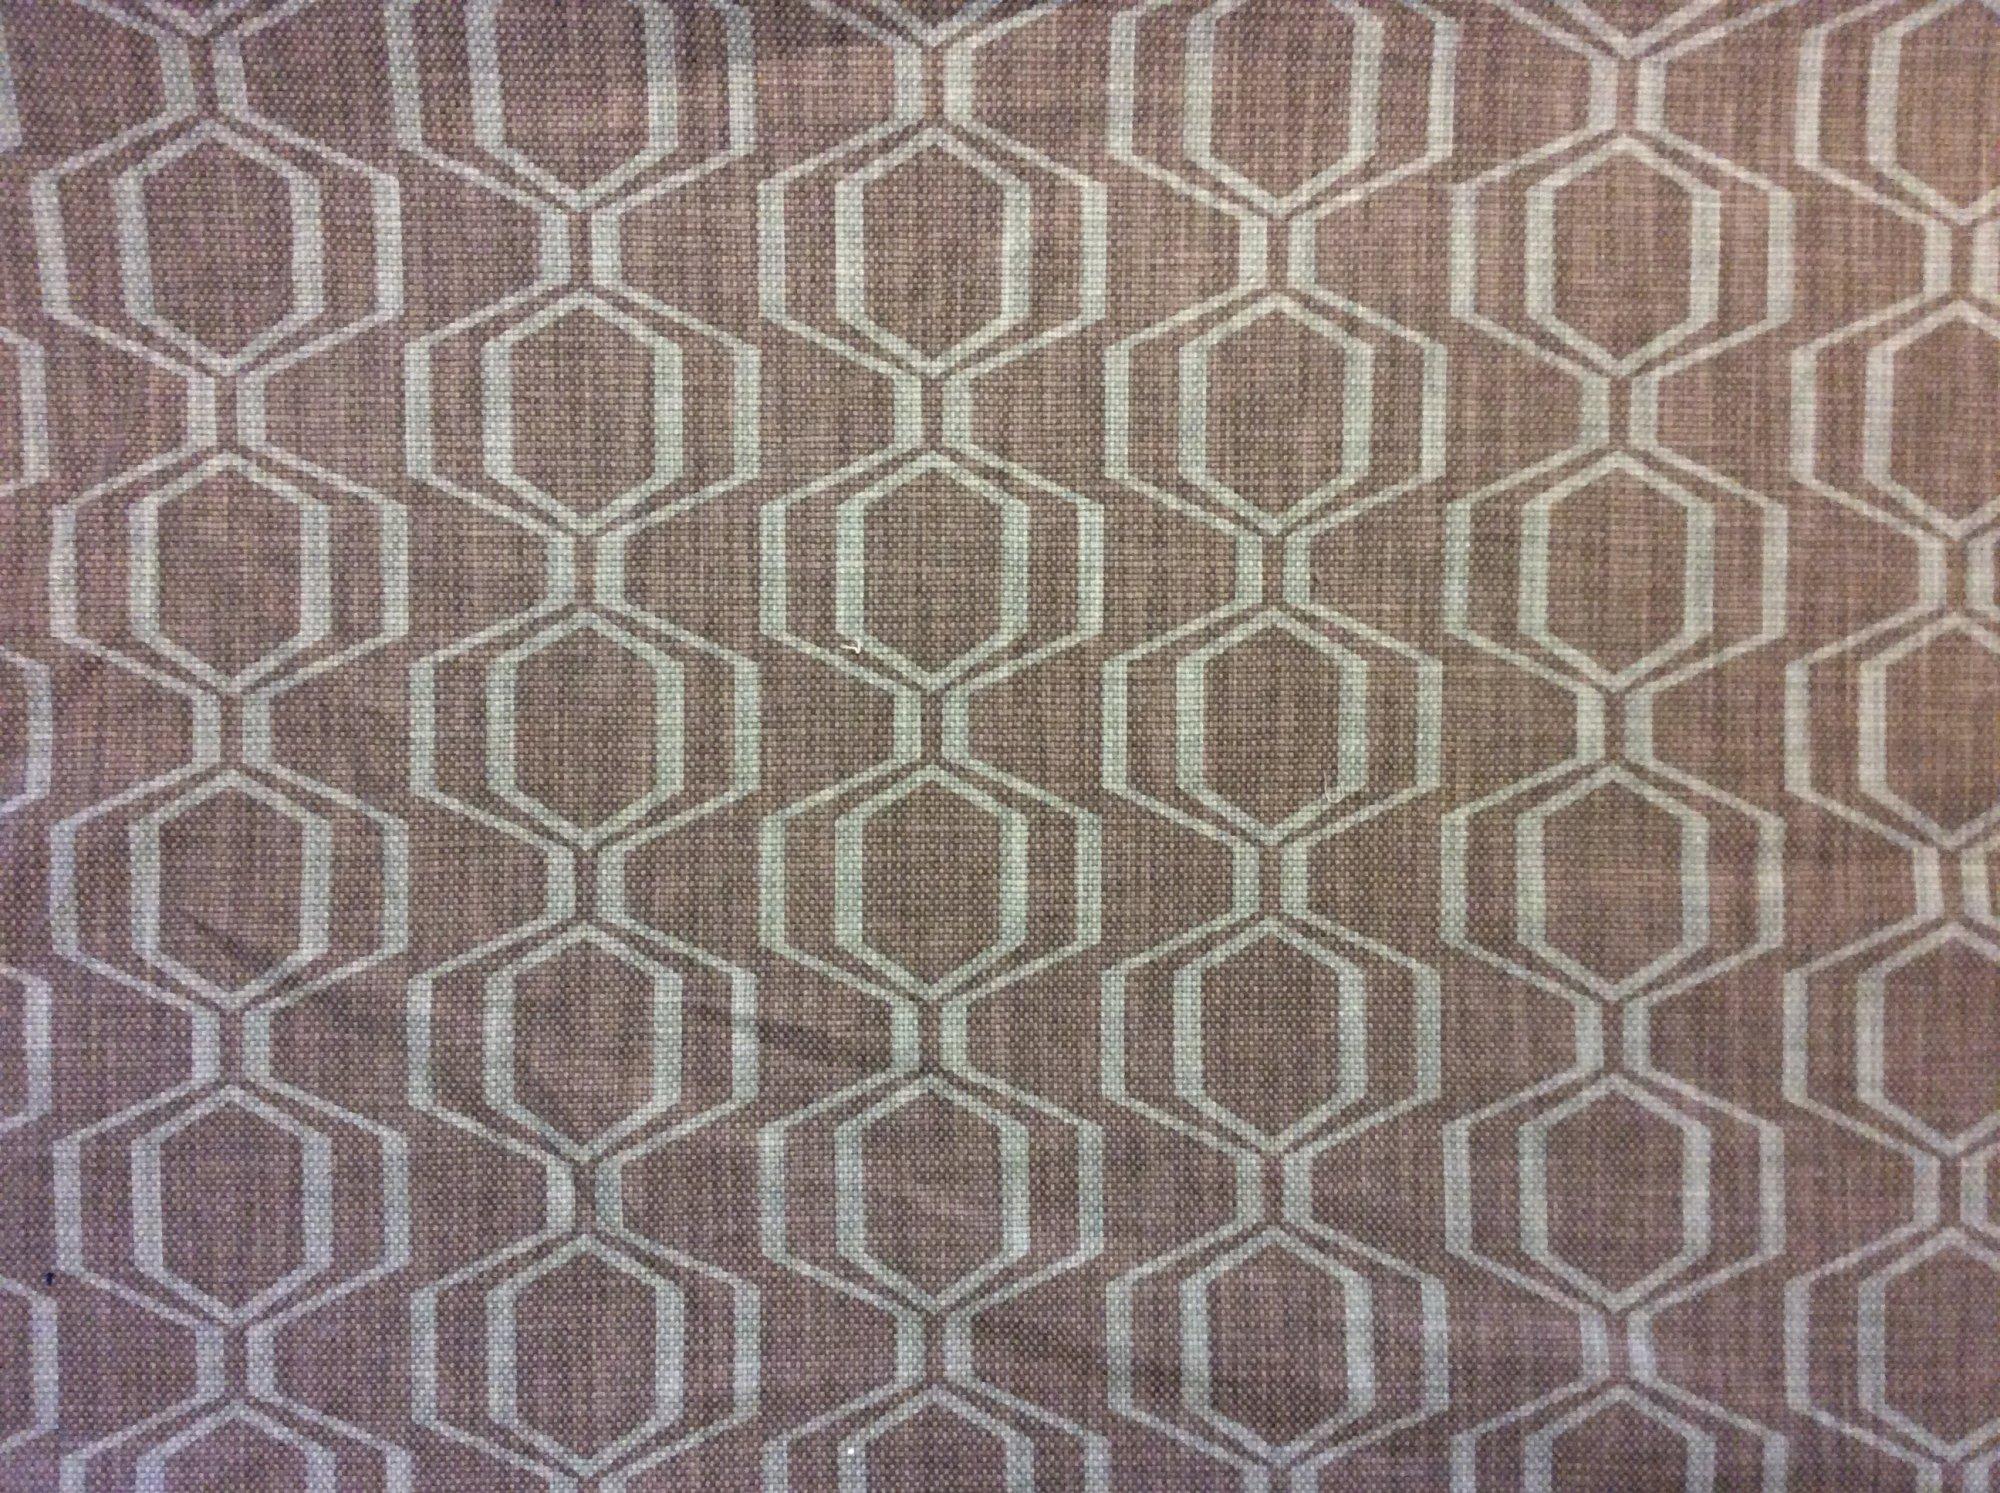 Mid Century Modern Look West Elm Warm Gray and Light Aqua Graphic Chain Link Lattice Heavy Print Home Decor Upholstery Fabric WELM001